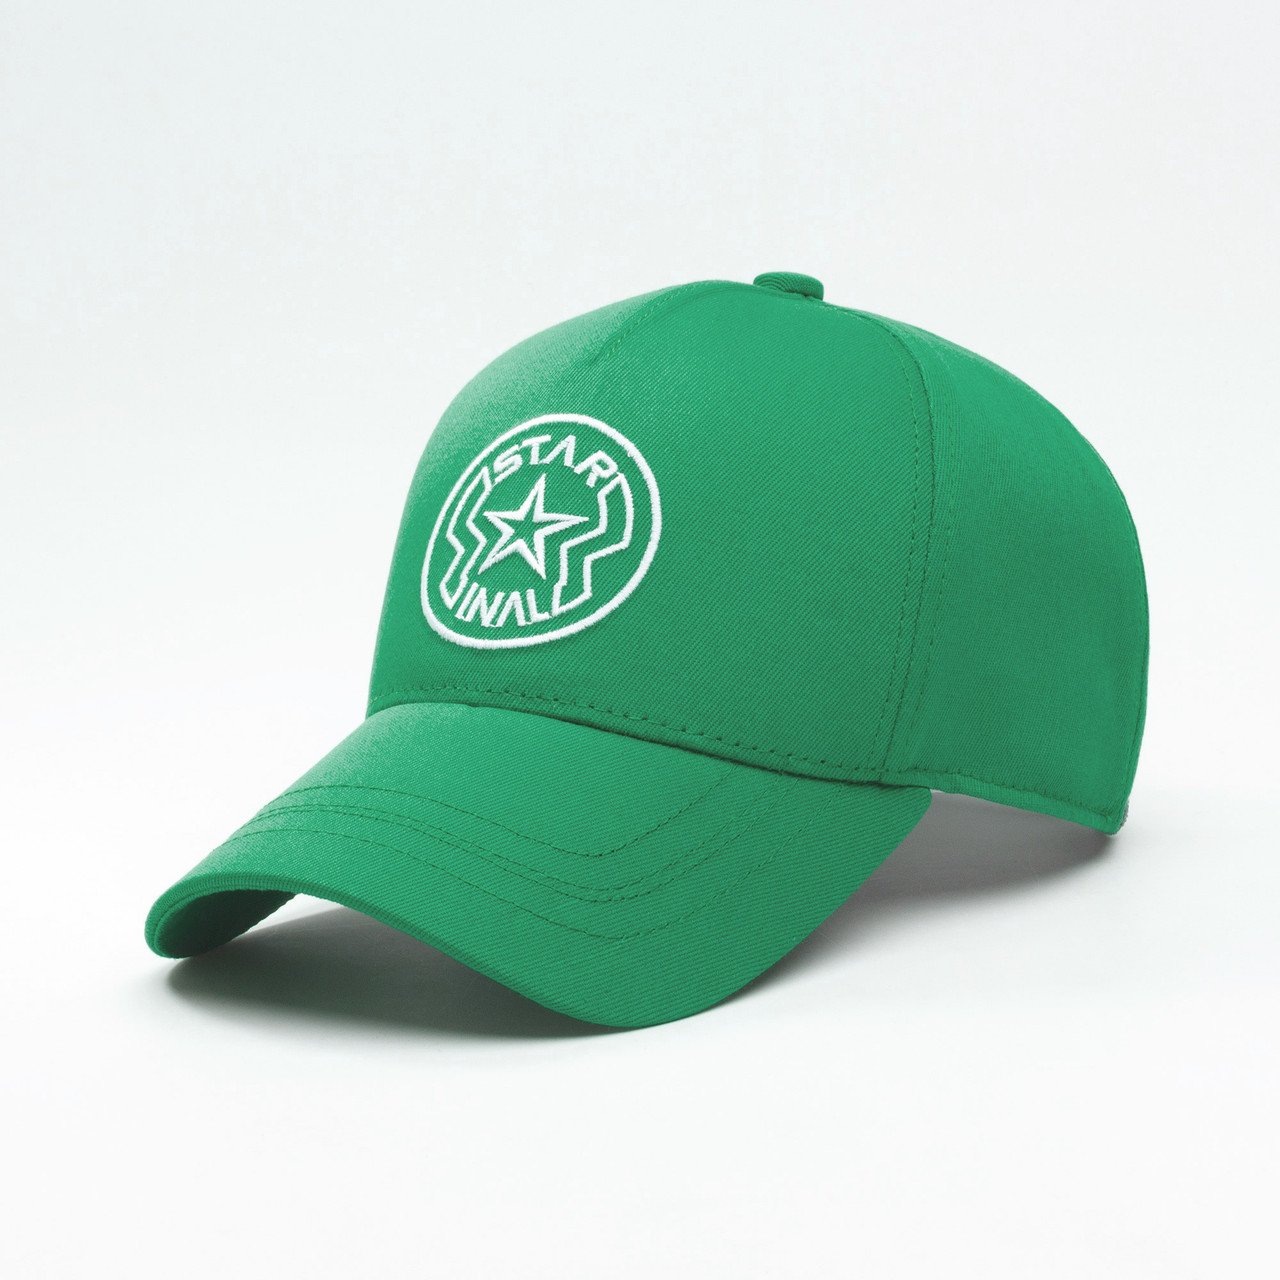 Детская кепка бейсболка INAL star XS / 51-52 RU Зеленый 239351